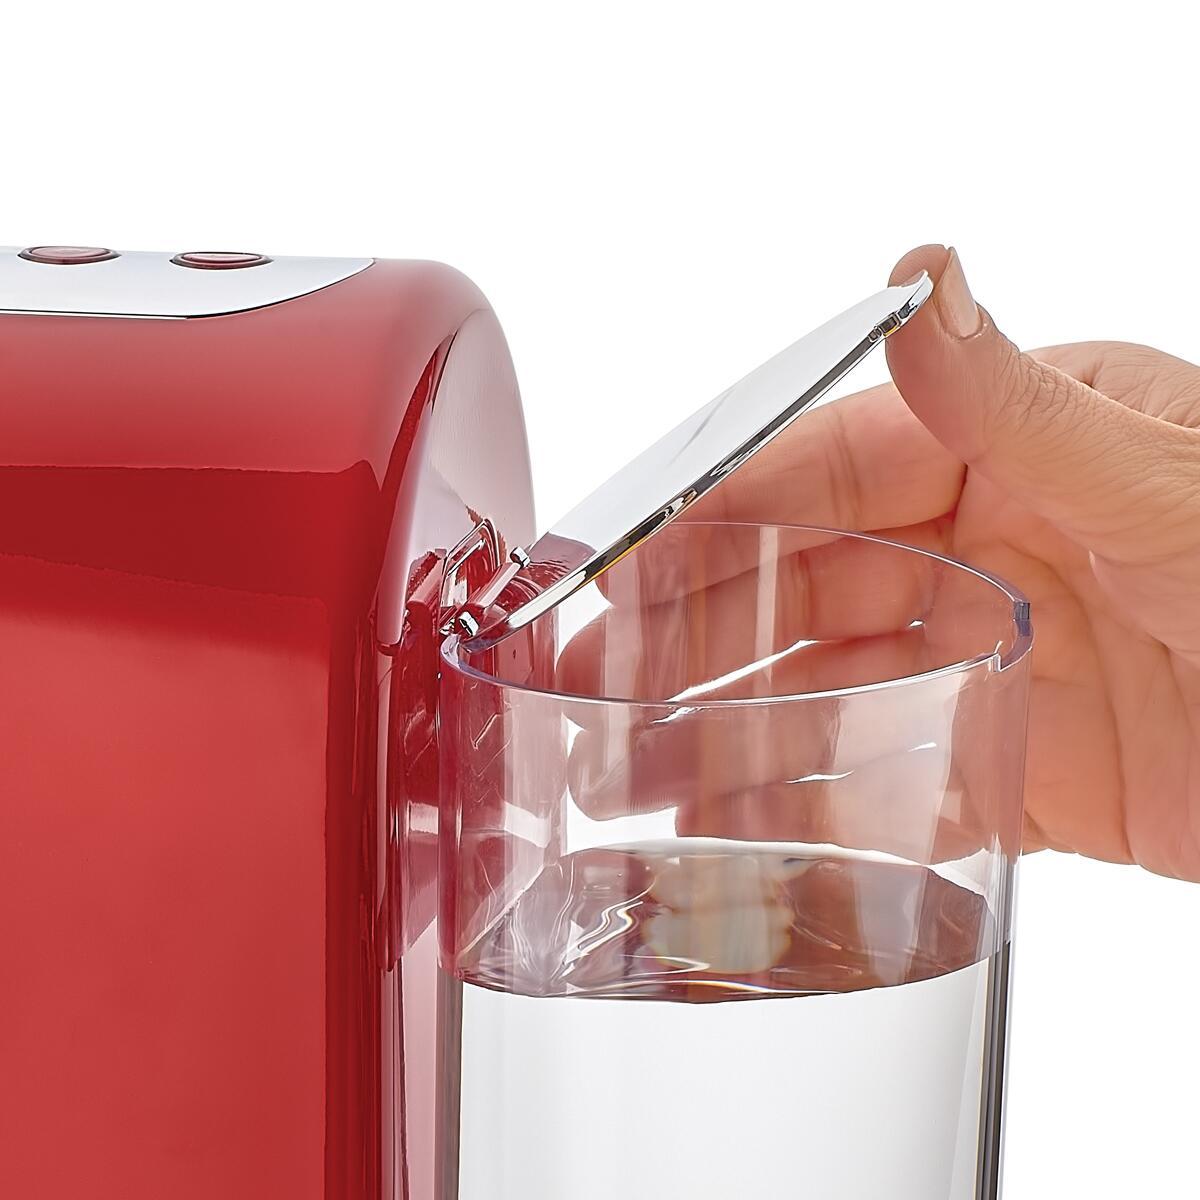 Korkmaz Kahvekolik Aqua Kırmızı/Krom Otomatik Kahve Makinesi